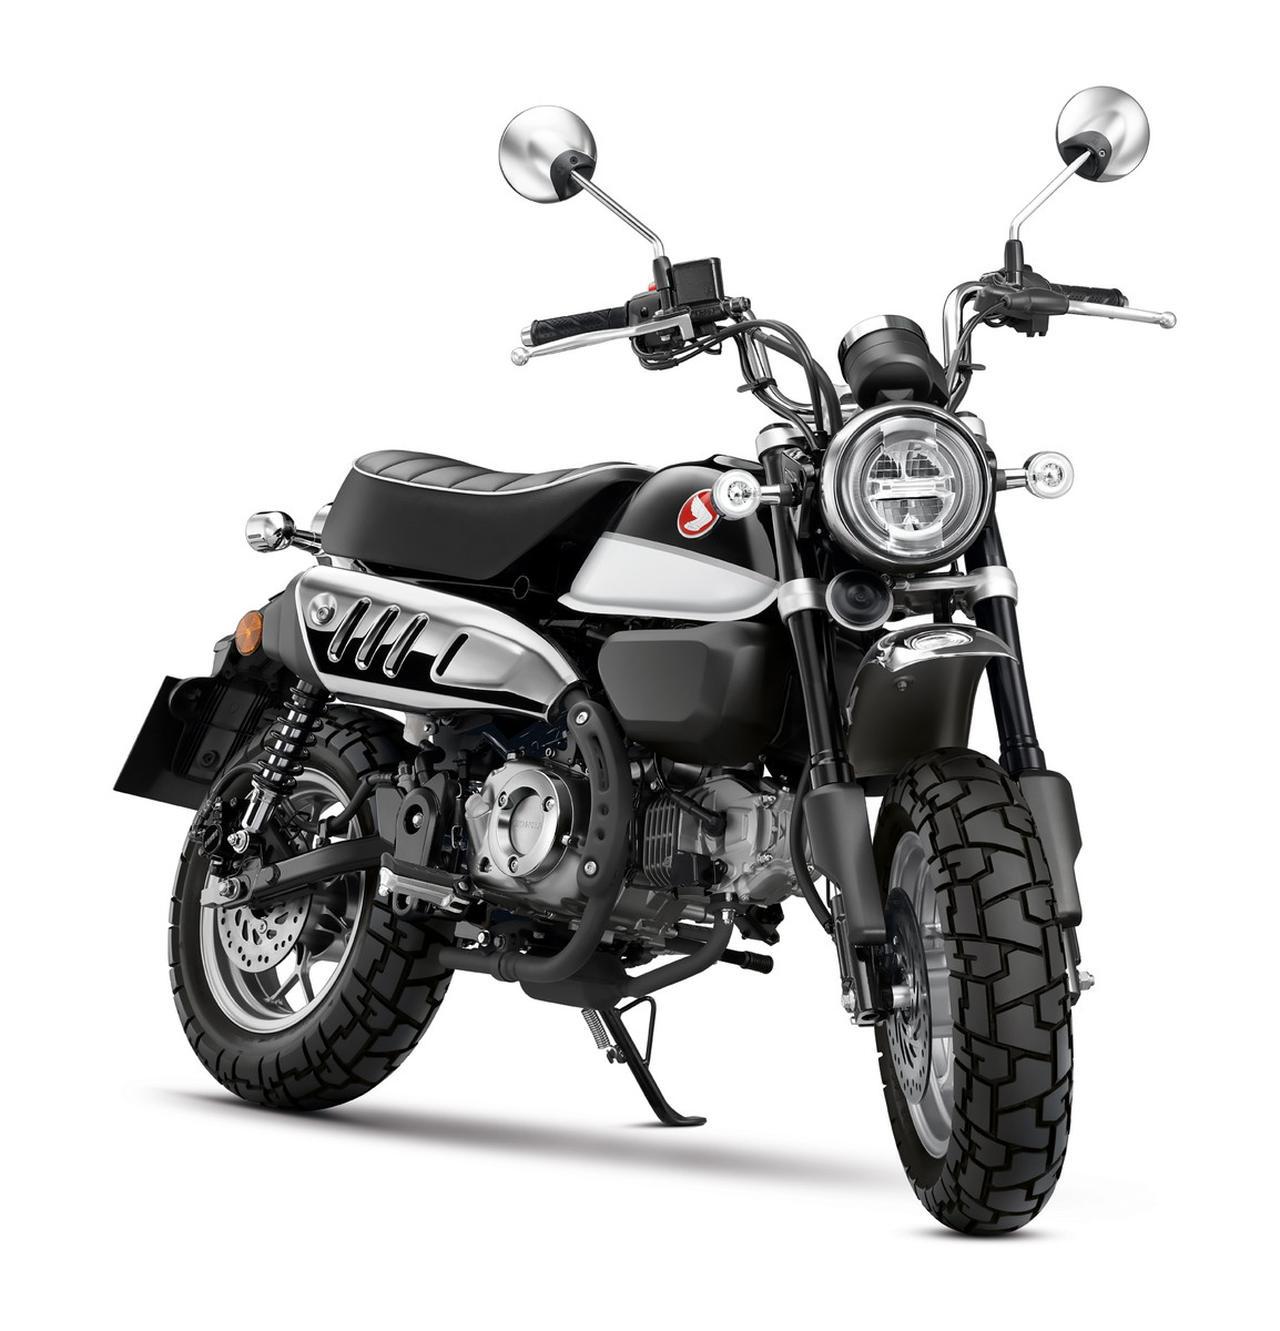 honda monkey price announcement australian motorcycle news. Black Bedroom Furniture Sets. Home Design Ideas